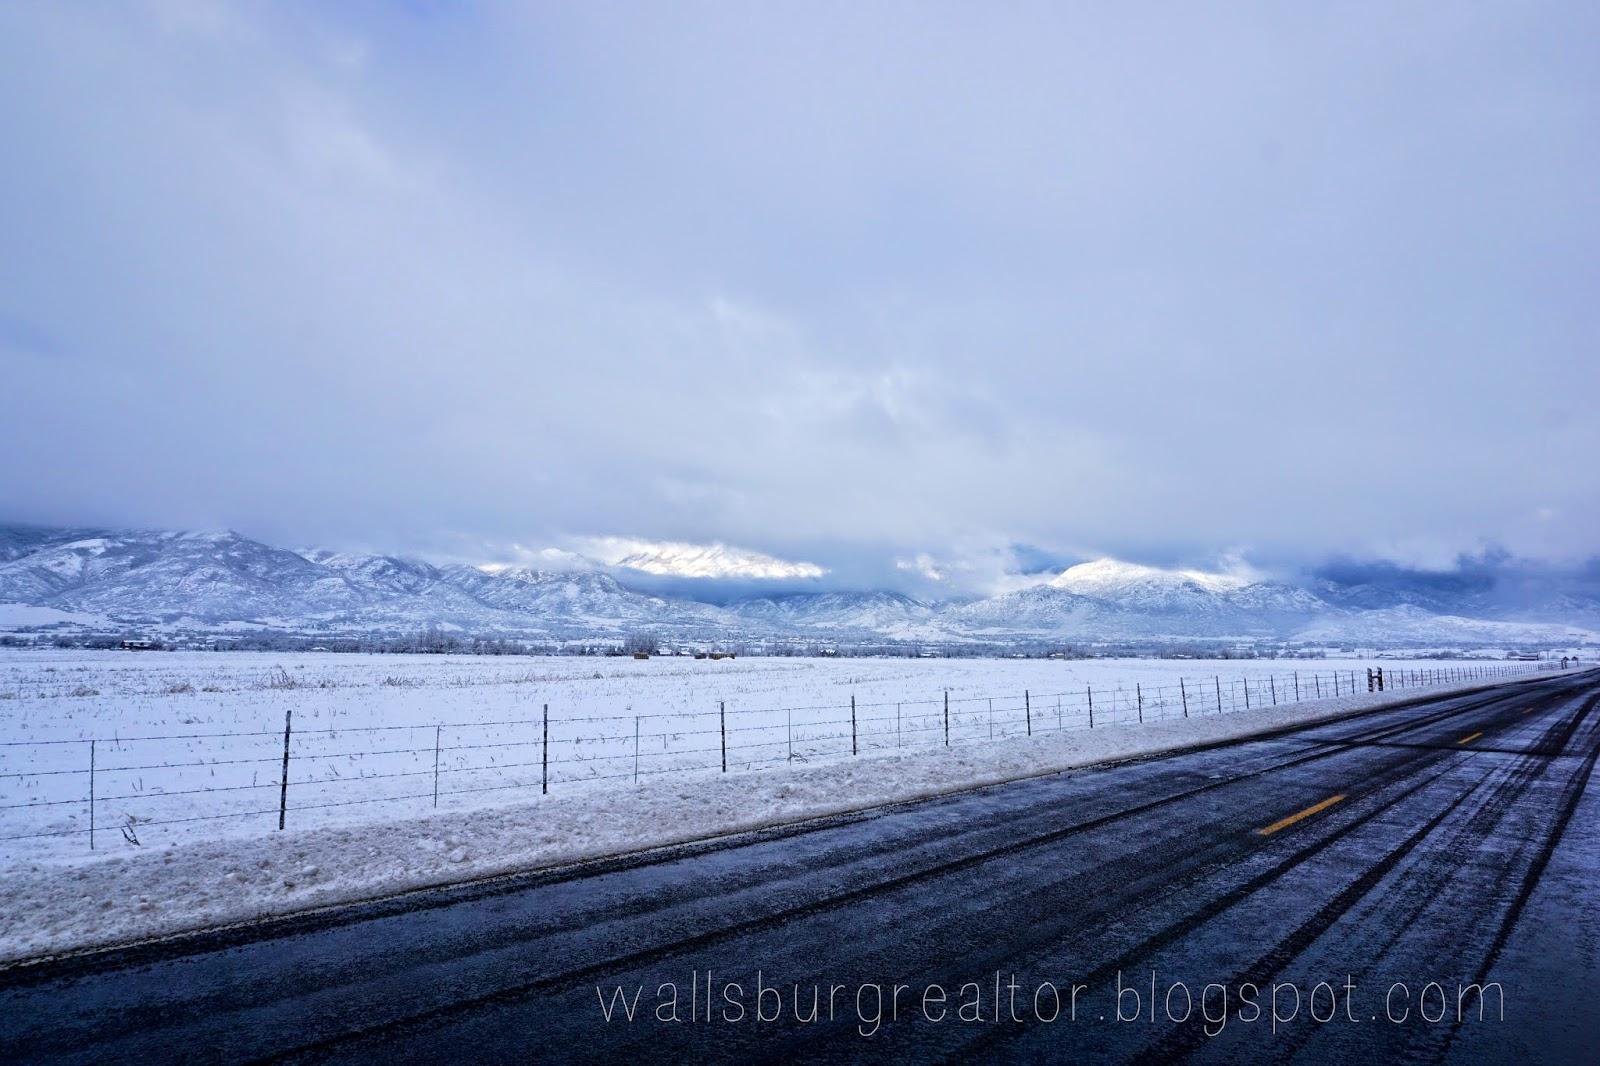 Snowy Roads Wallsburg